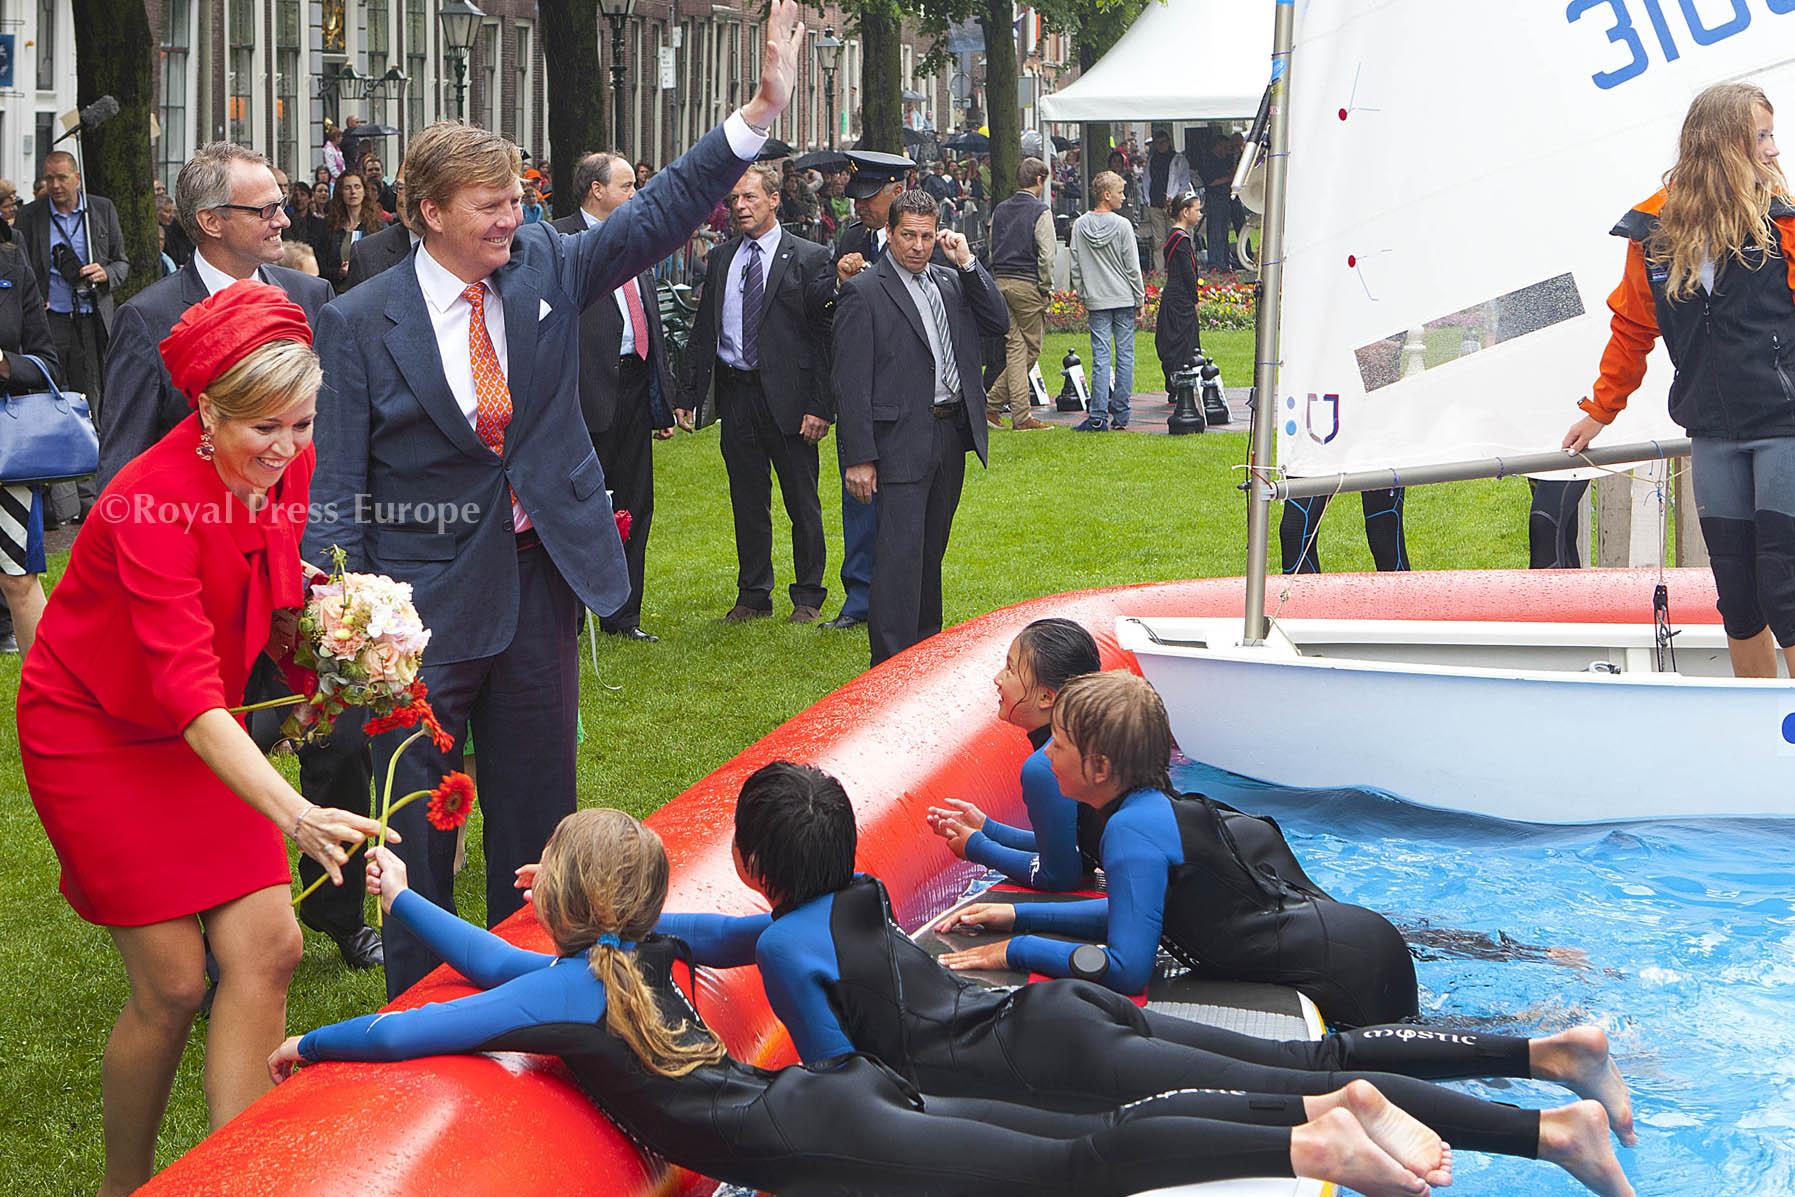 ROYALBLOG NL: Zwaaien, dat doet koningspaar ook in bed